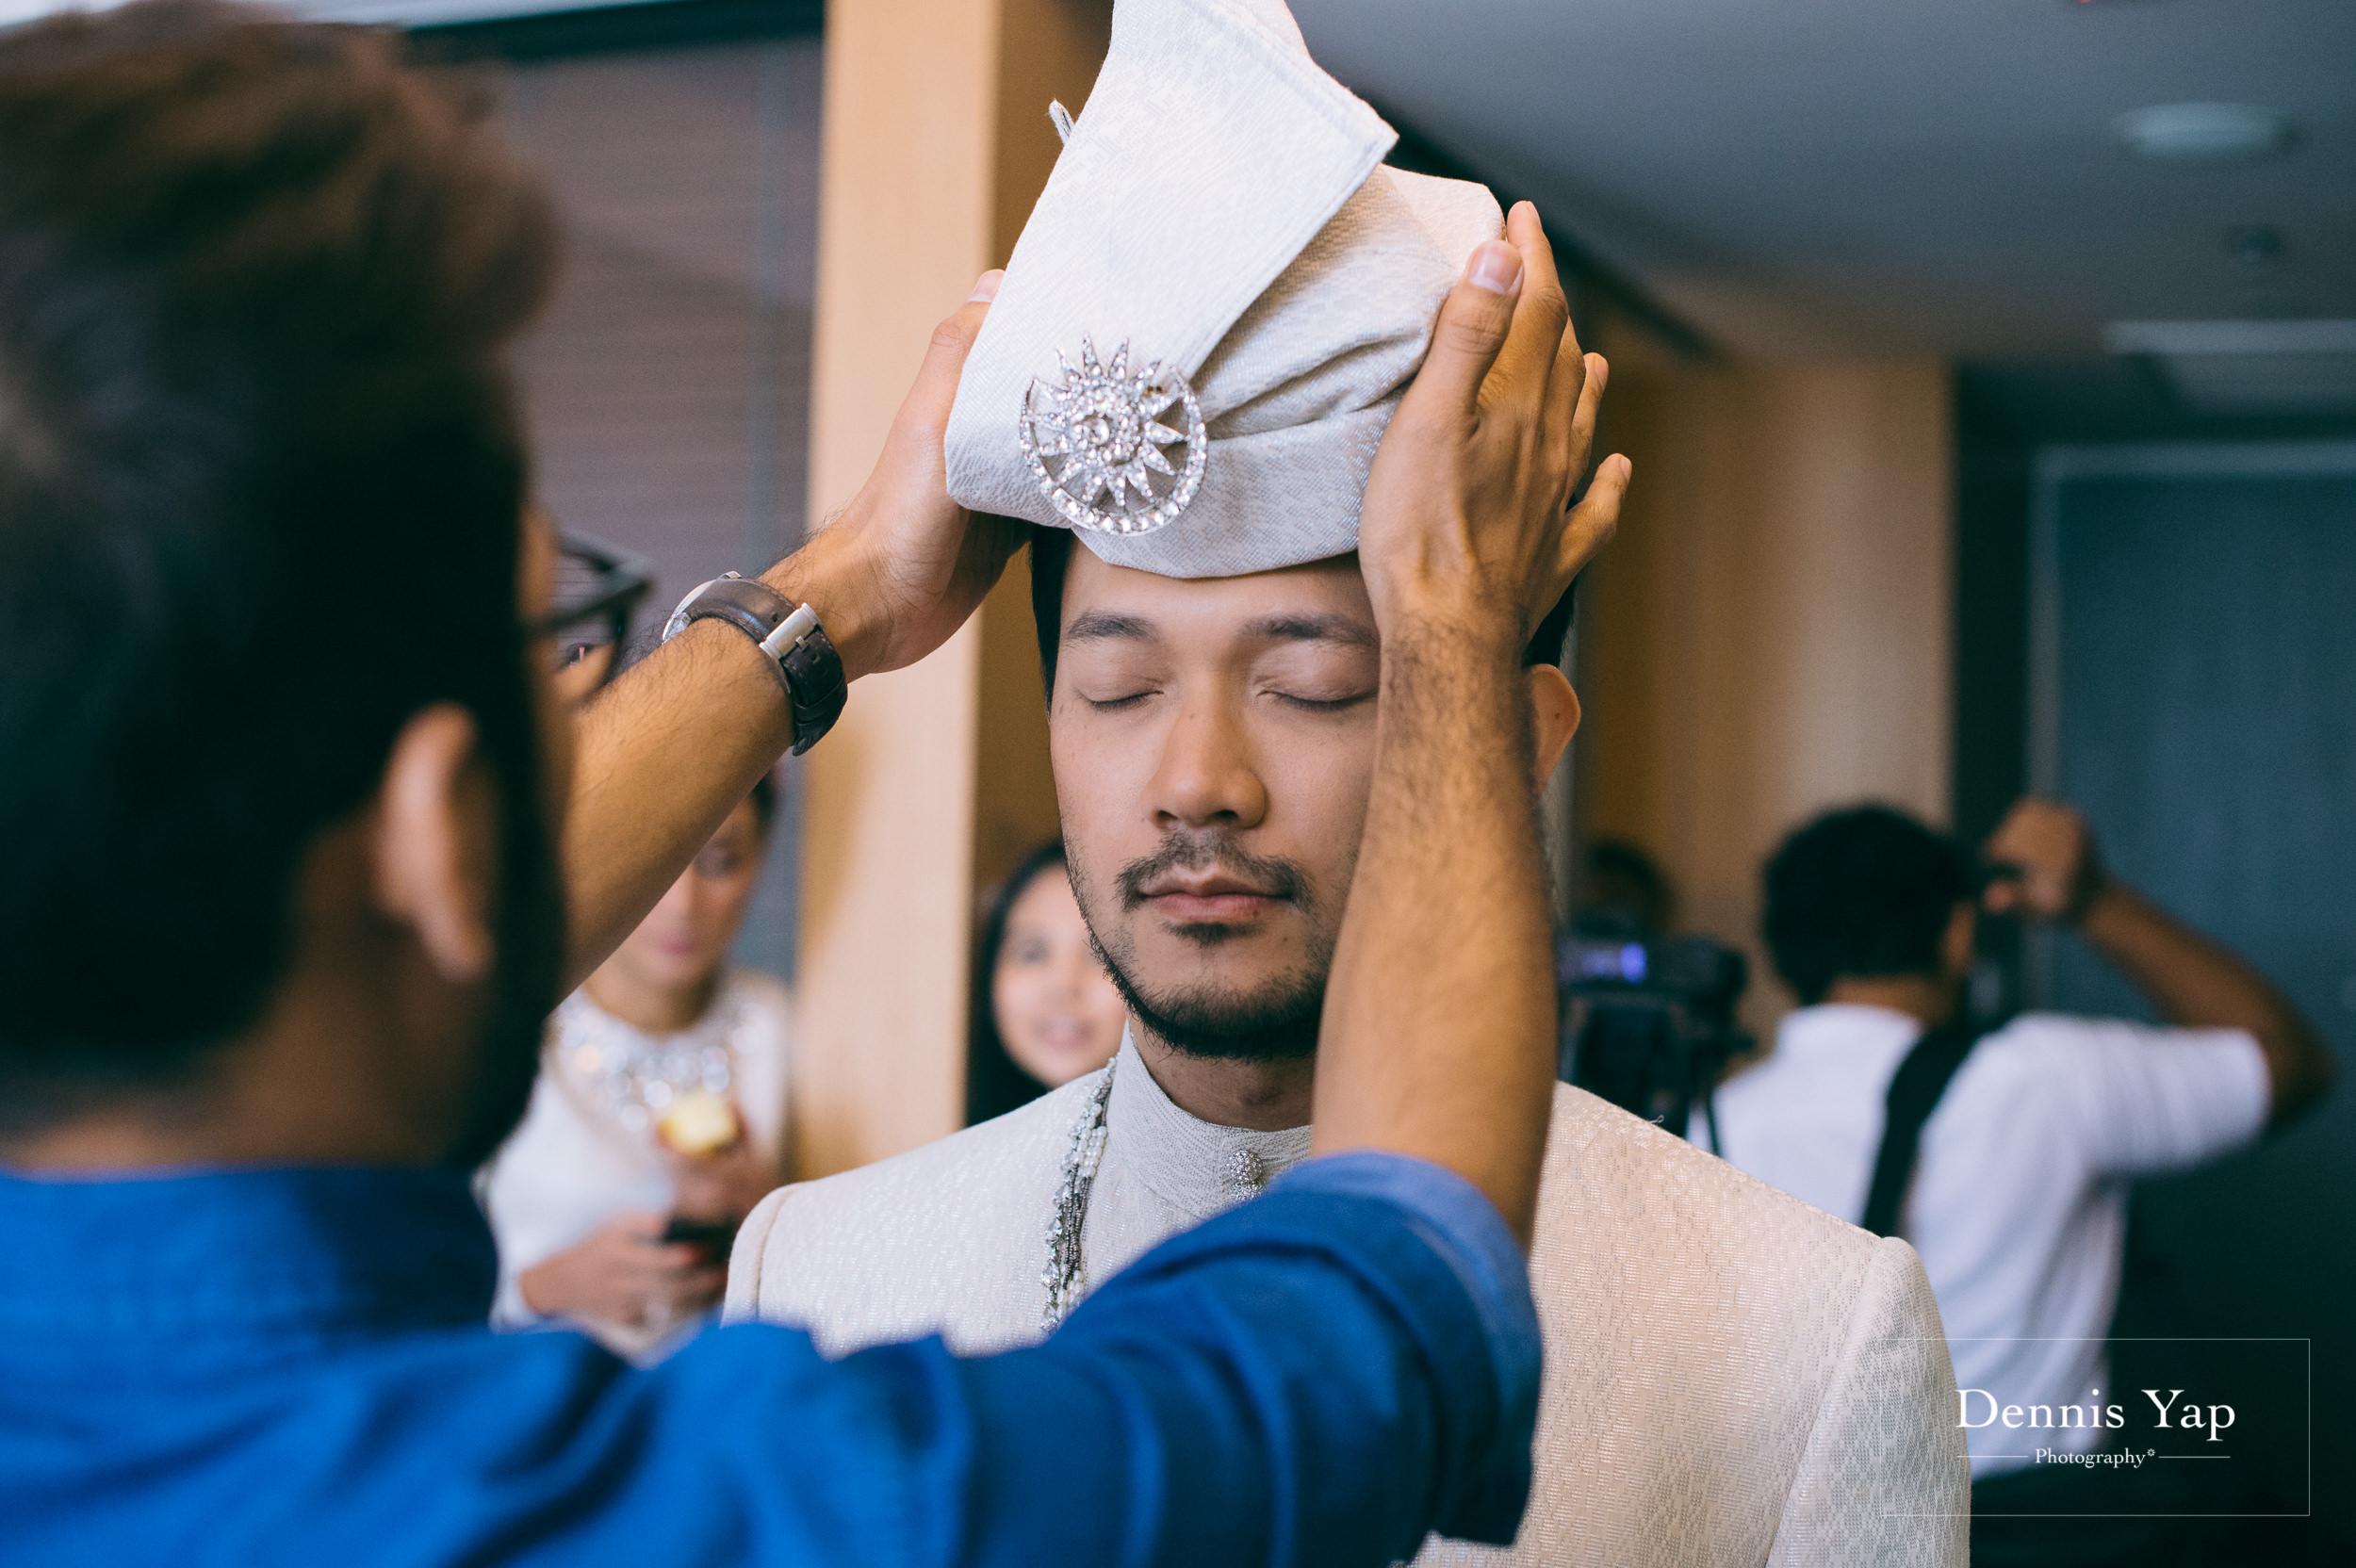 zarif hanalili malay wedding blessing ceremony dennis yap photography-7.jpg